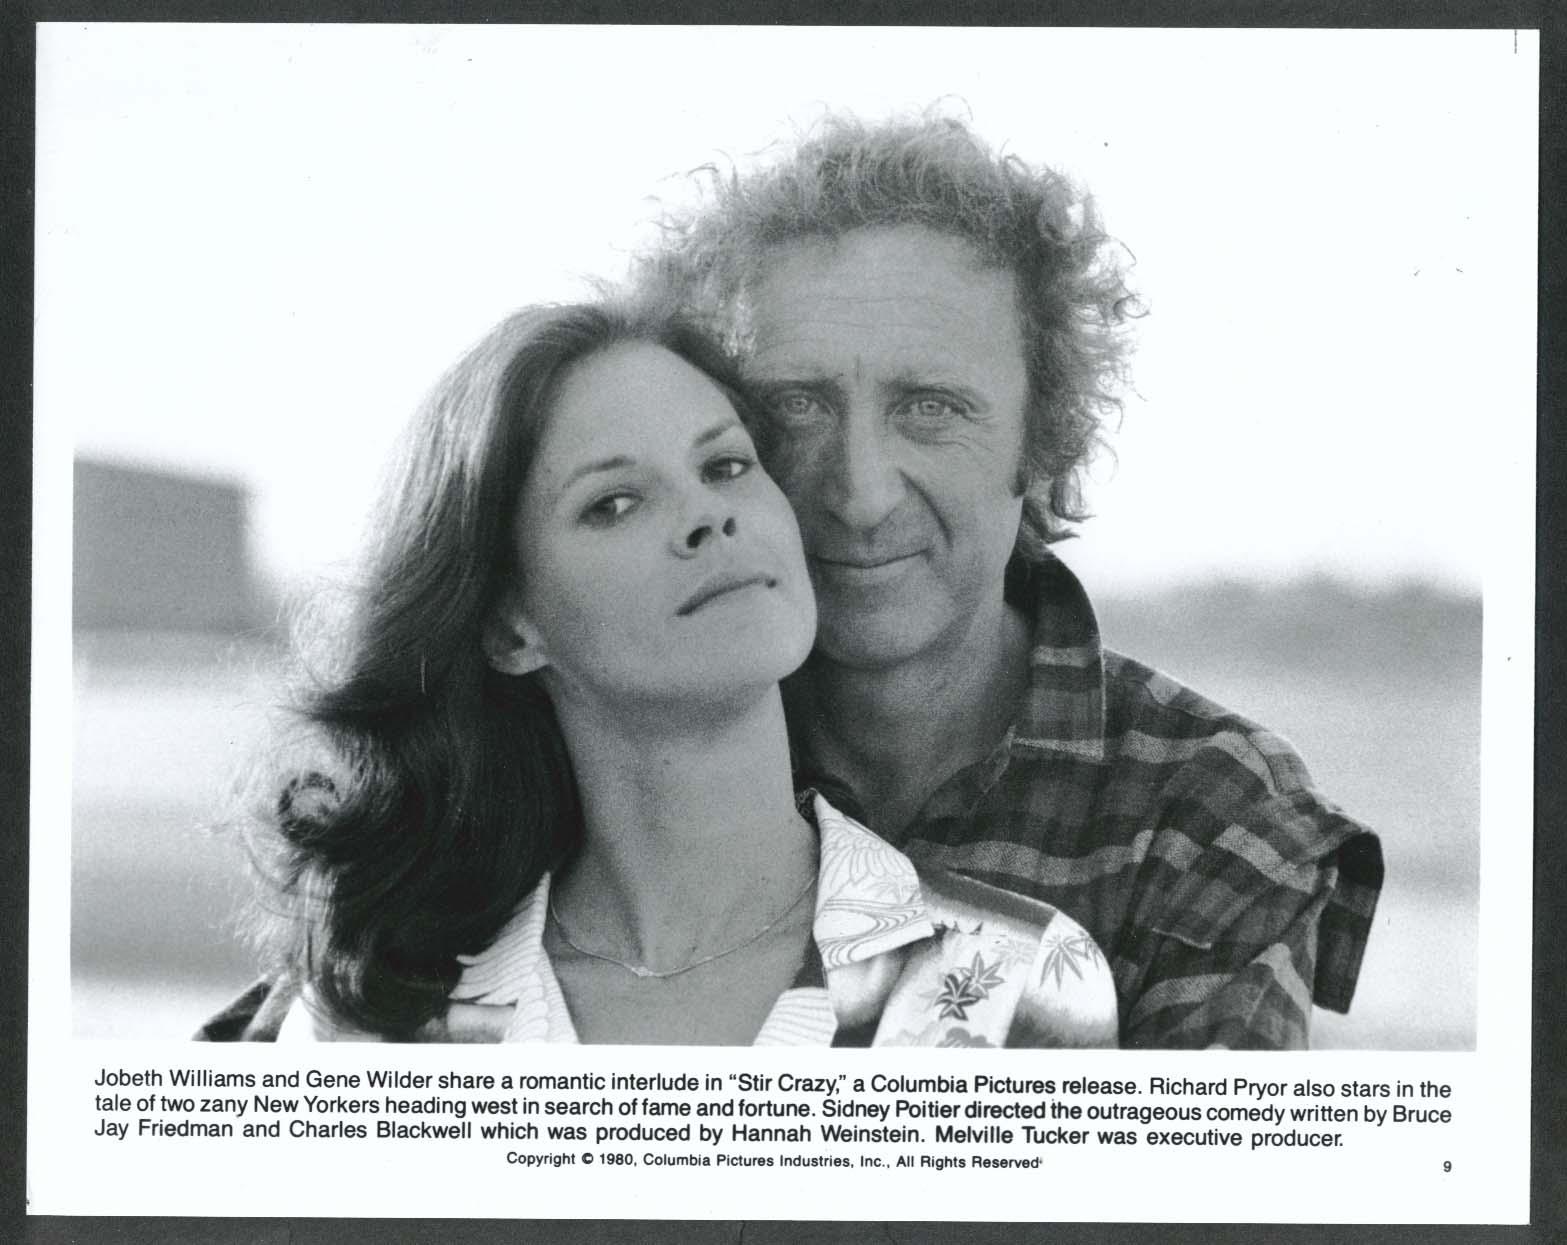 Image for Jobeth Williams Gene Wilder Stir Crazy 8x10 photograph 1980